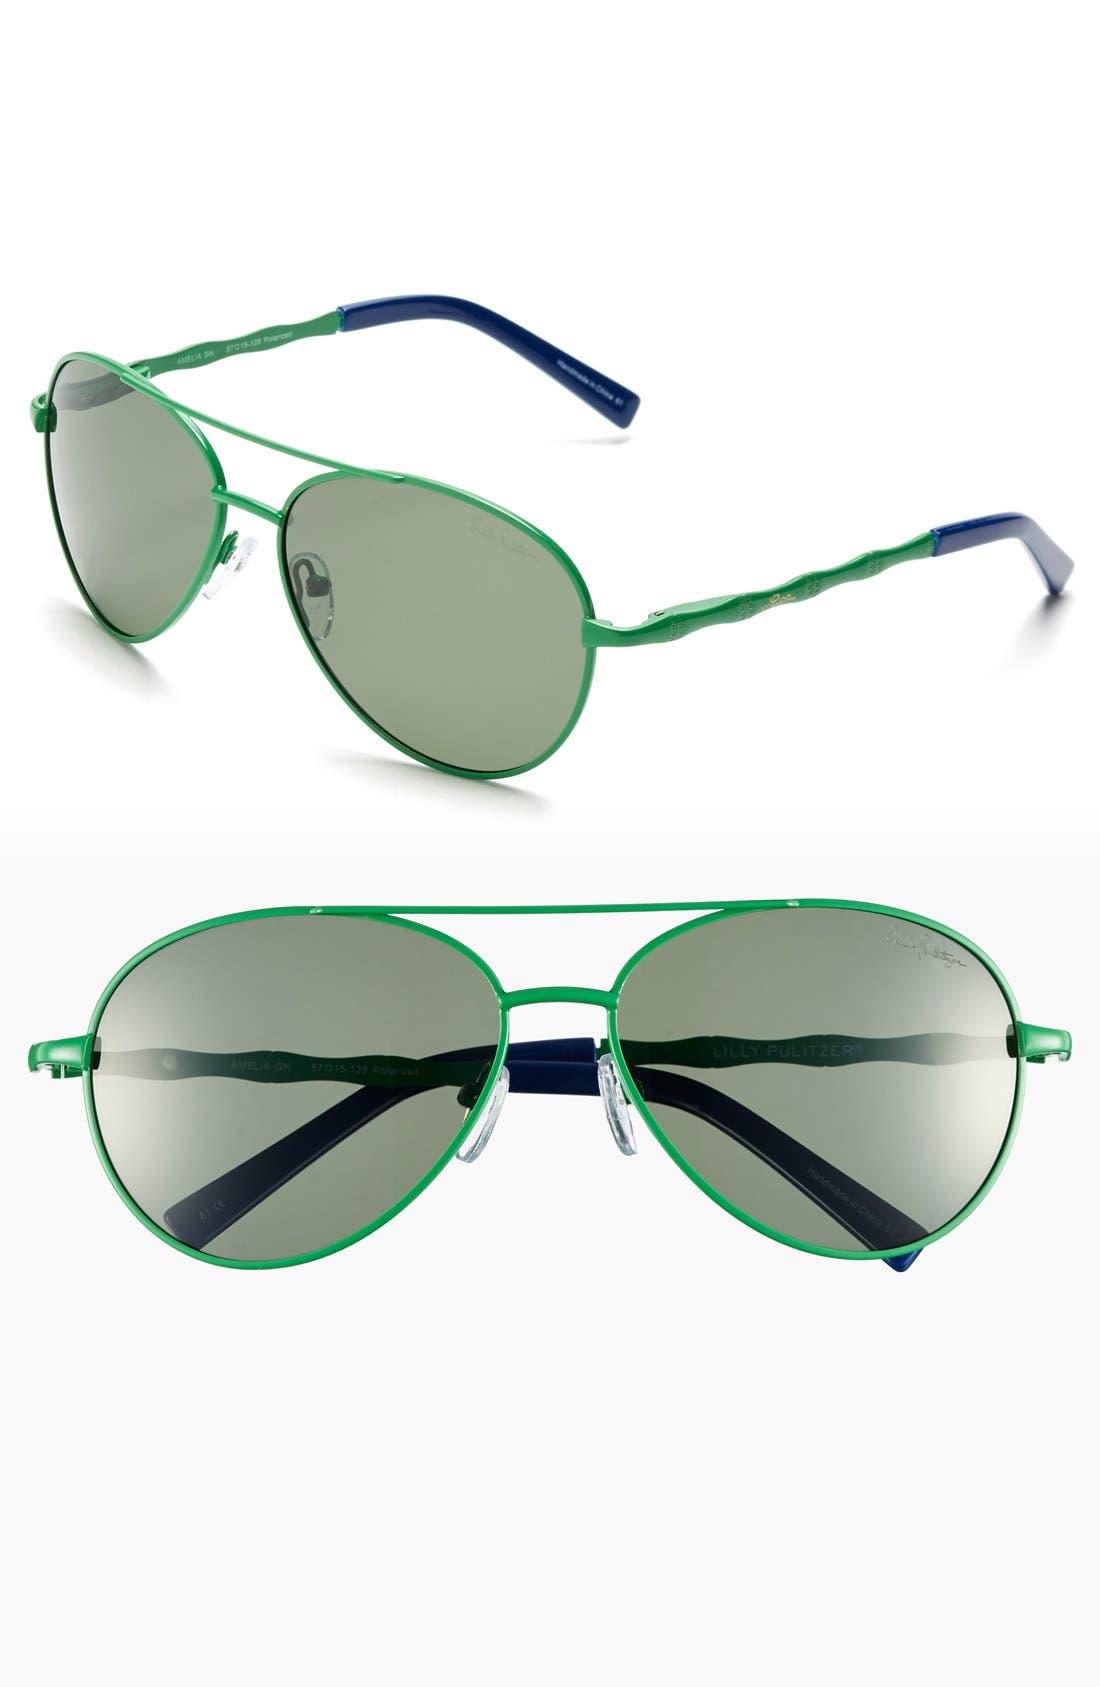 Alternate Image 1 Selected - Lilly Pulitzer® 'Amelia' 57mm Polarized Aviator Sunglasses